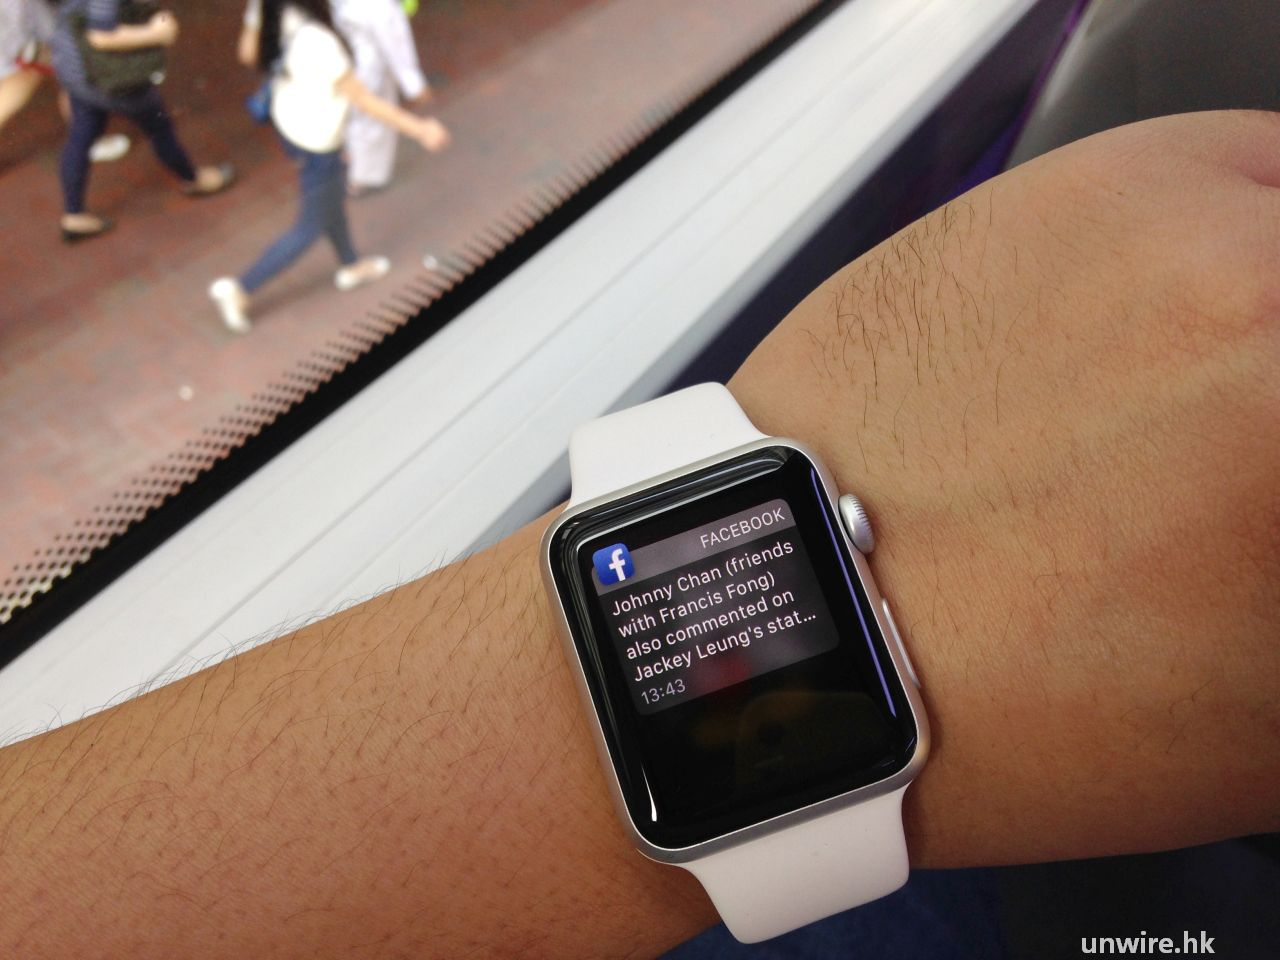 Apple Watch 全方位生活助手!10 大必裝 APPS 推介 - UNWIRE.HK